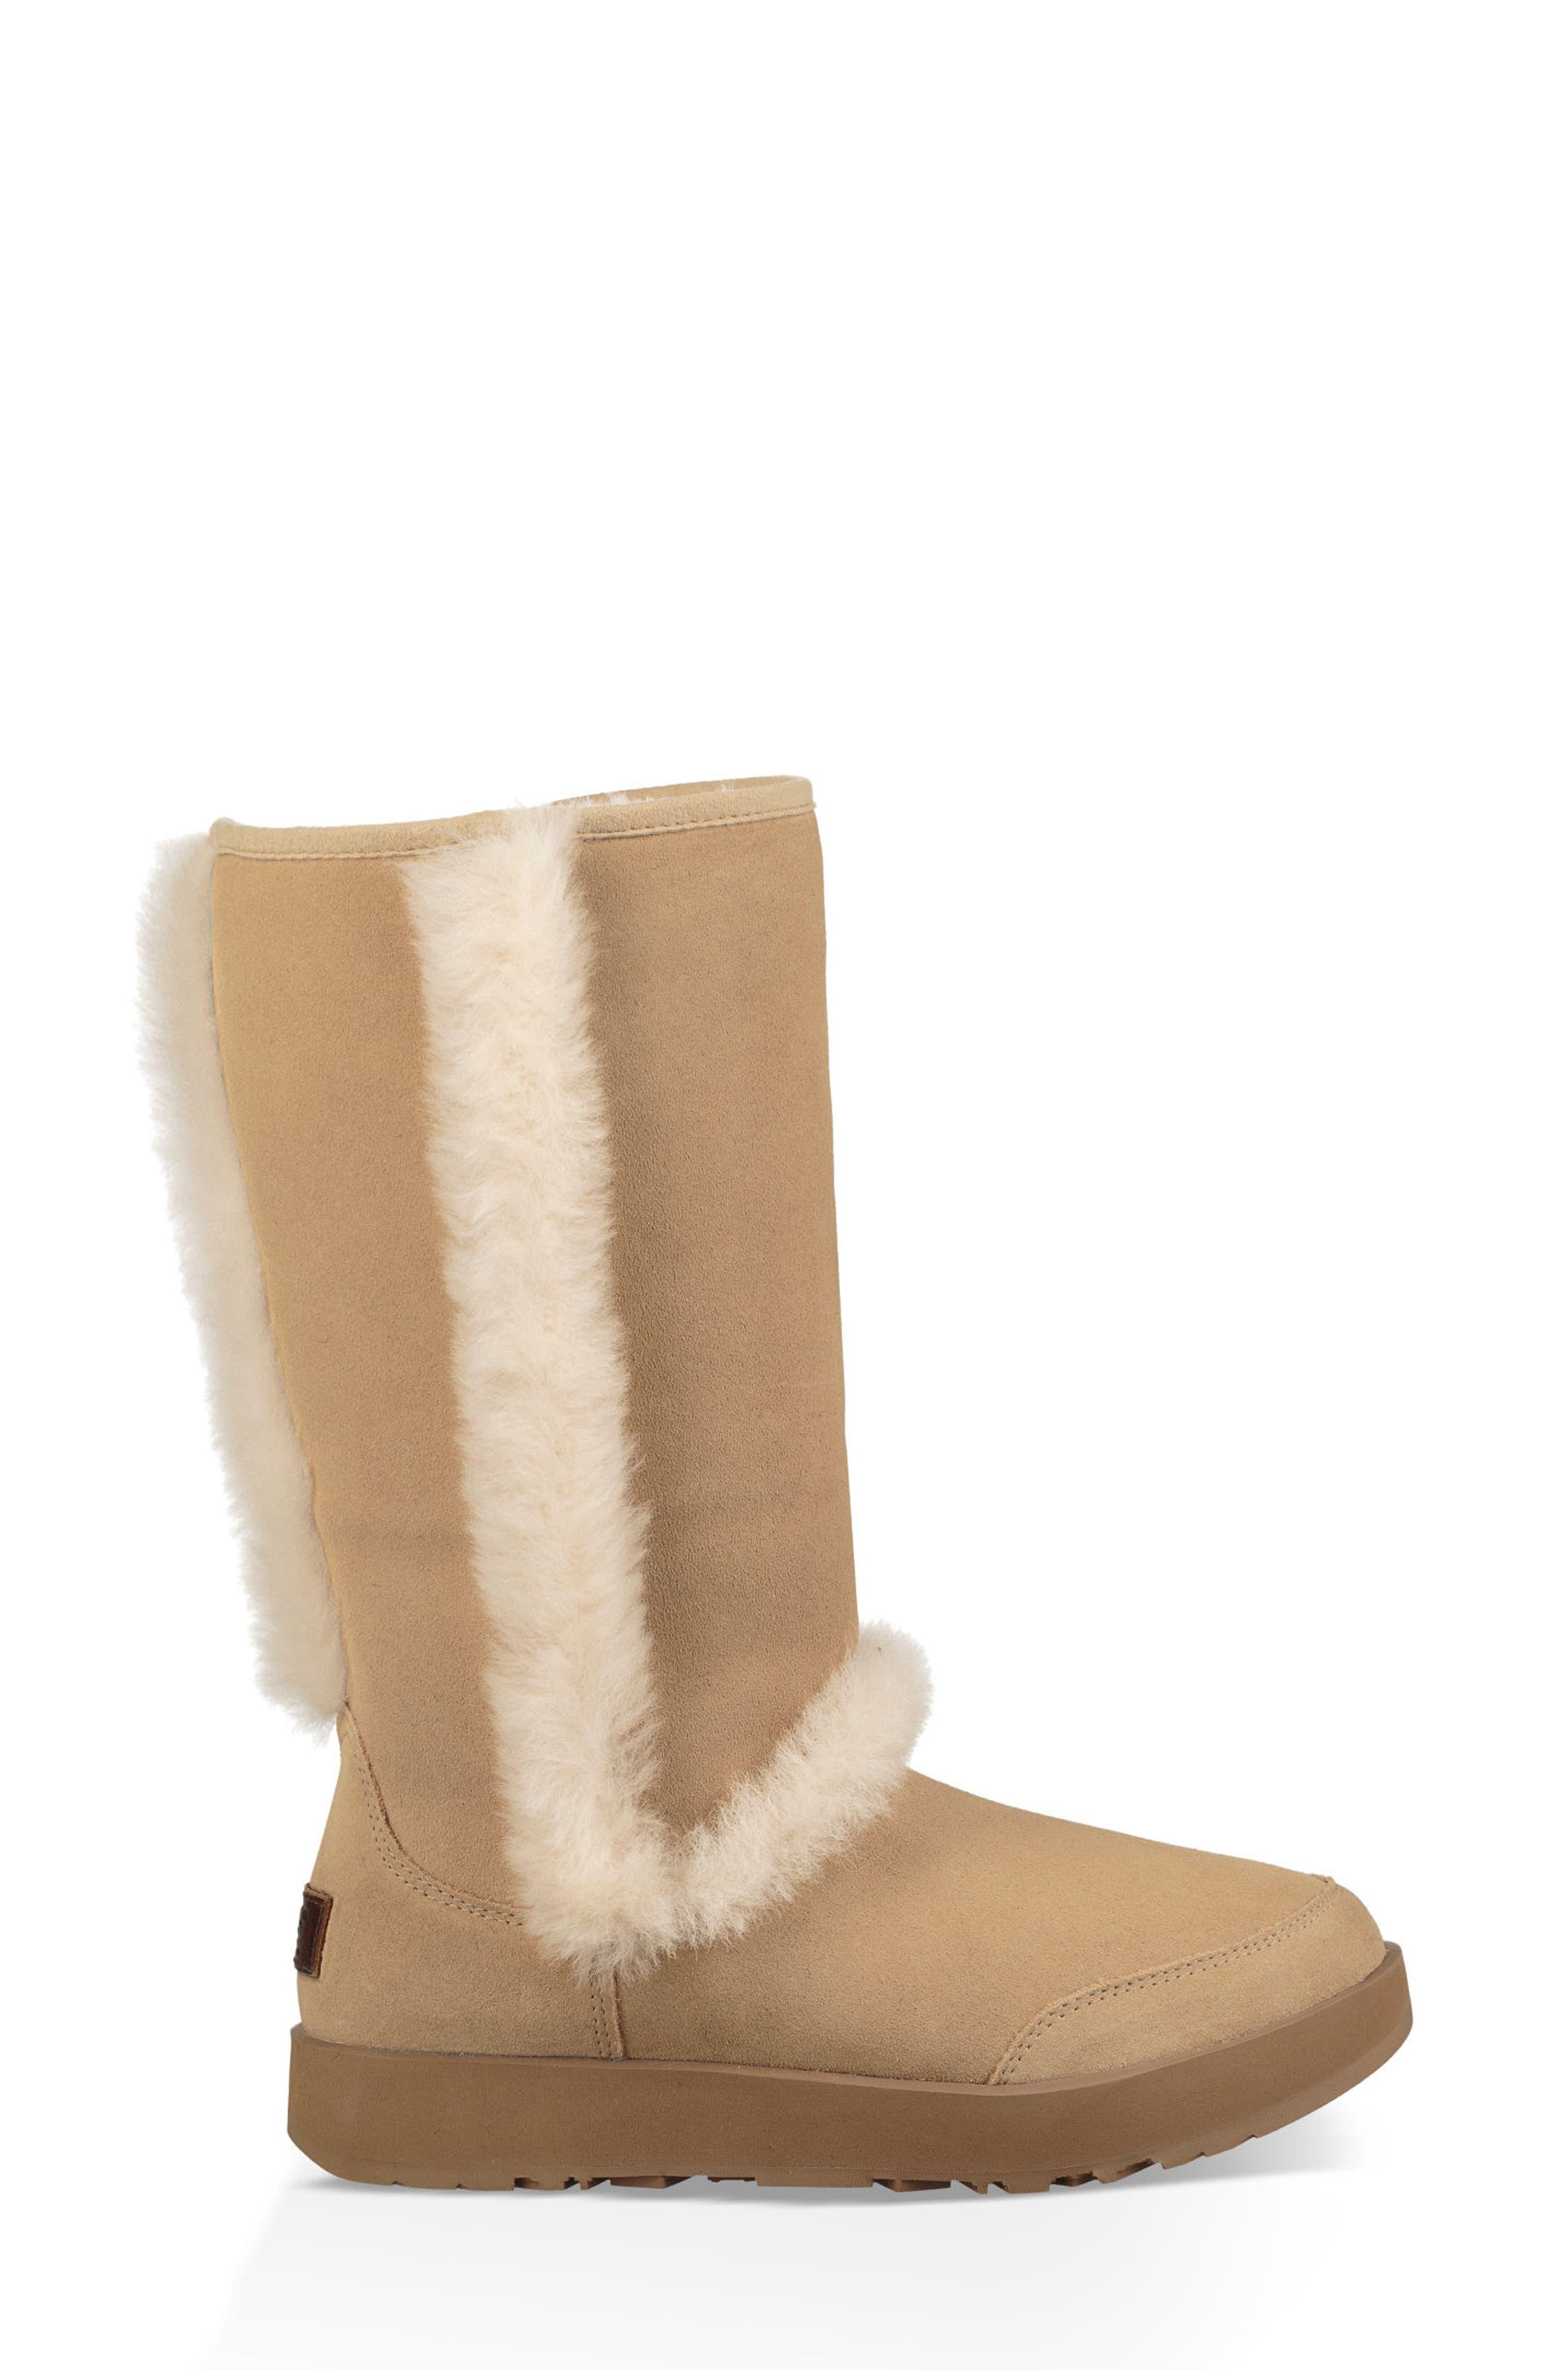 Sundance Genuine Shearling Waterproof Boot,                             Alternate thumbnail 4, color,                             251